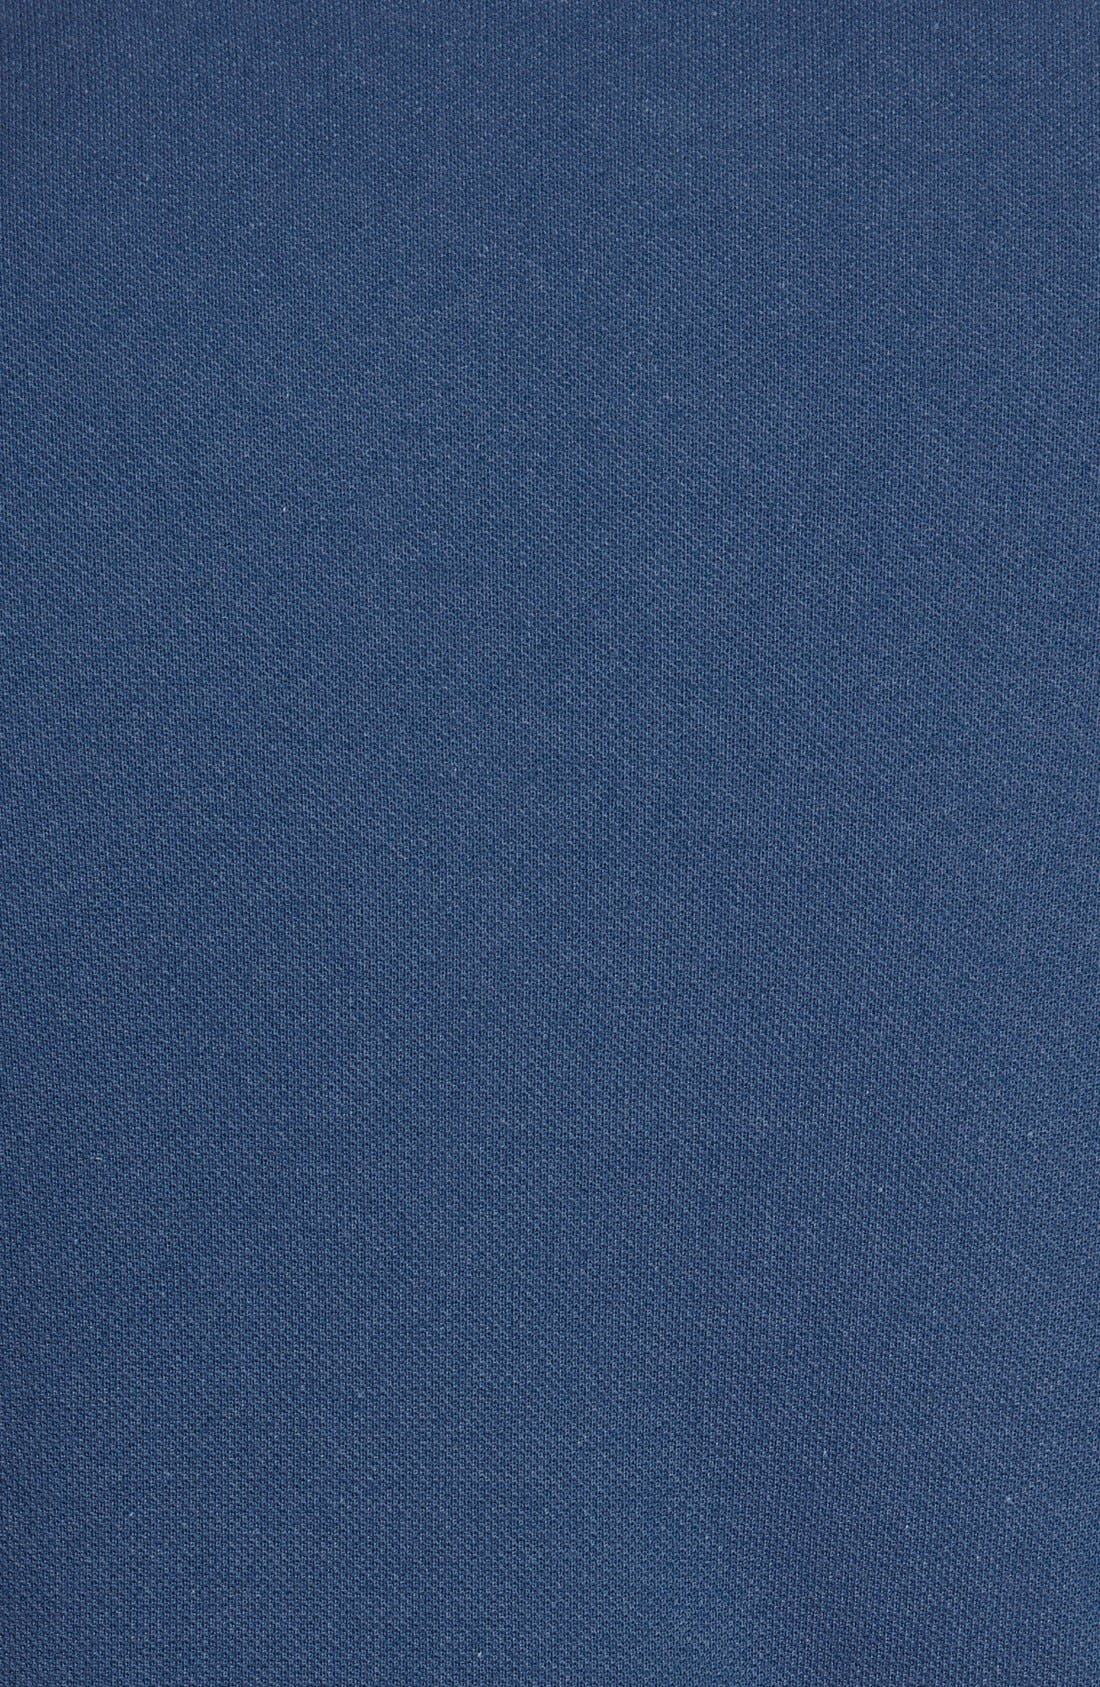 Alternate Image 3  - Lacoste Piqué Polo with Rubber Logo